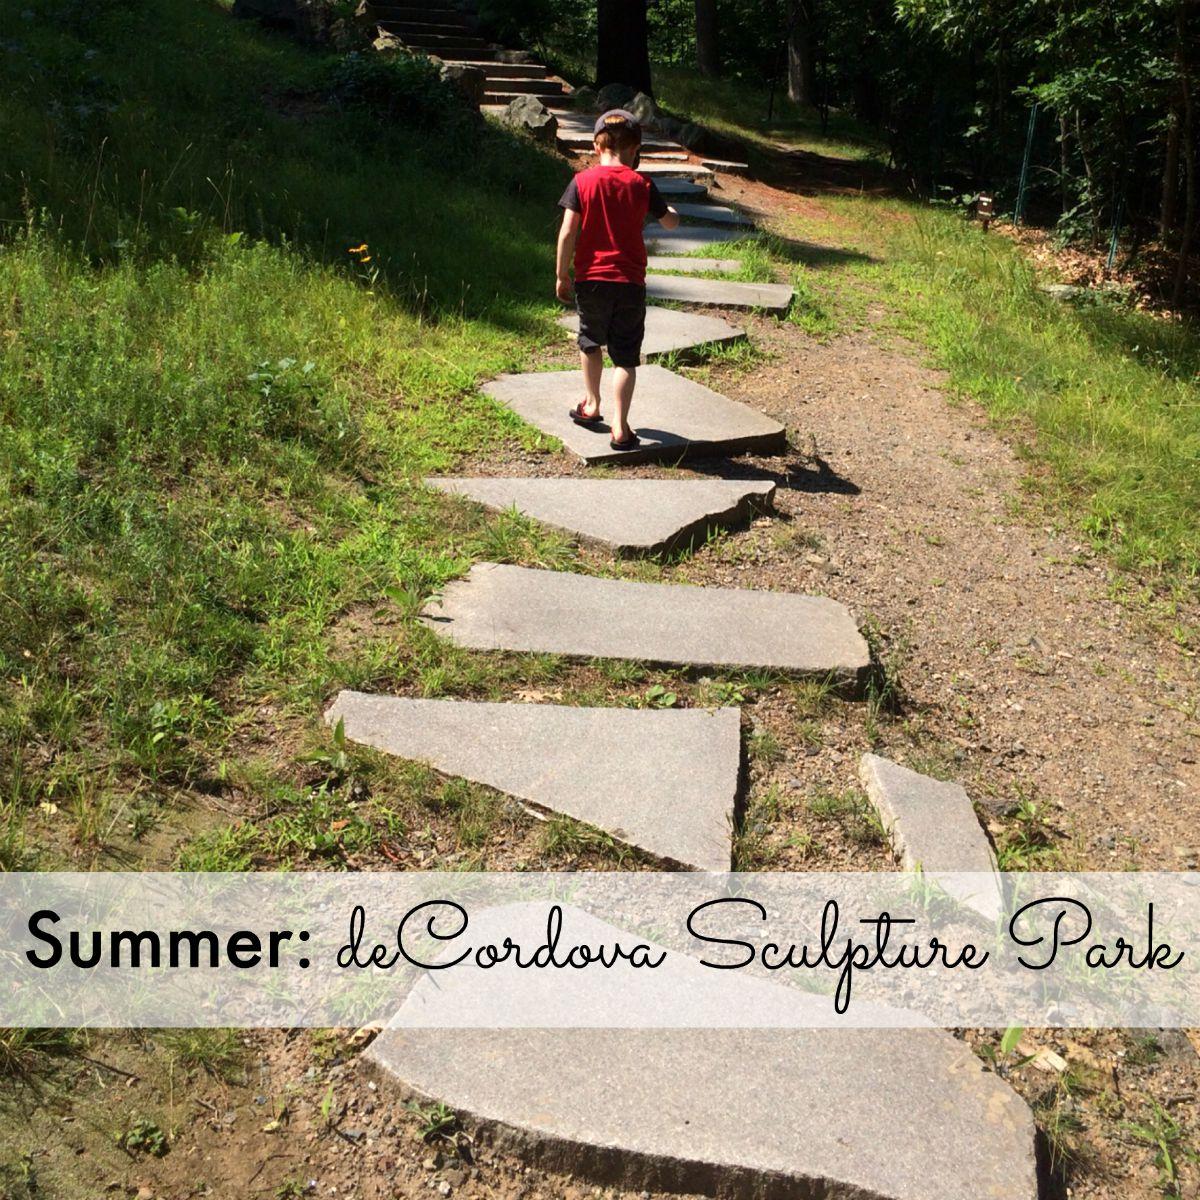 Summer: deCordova Sculpture Park